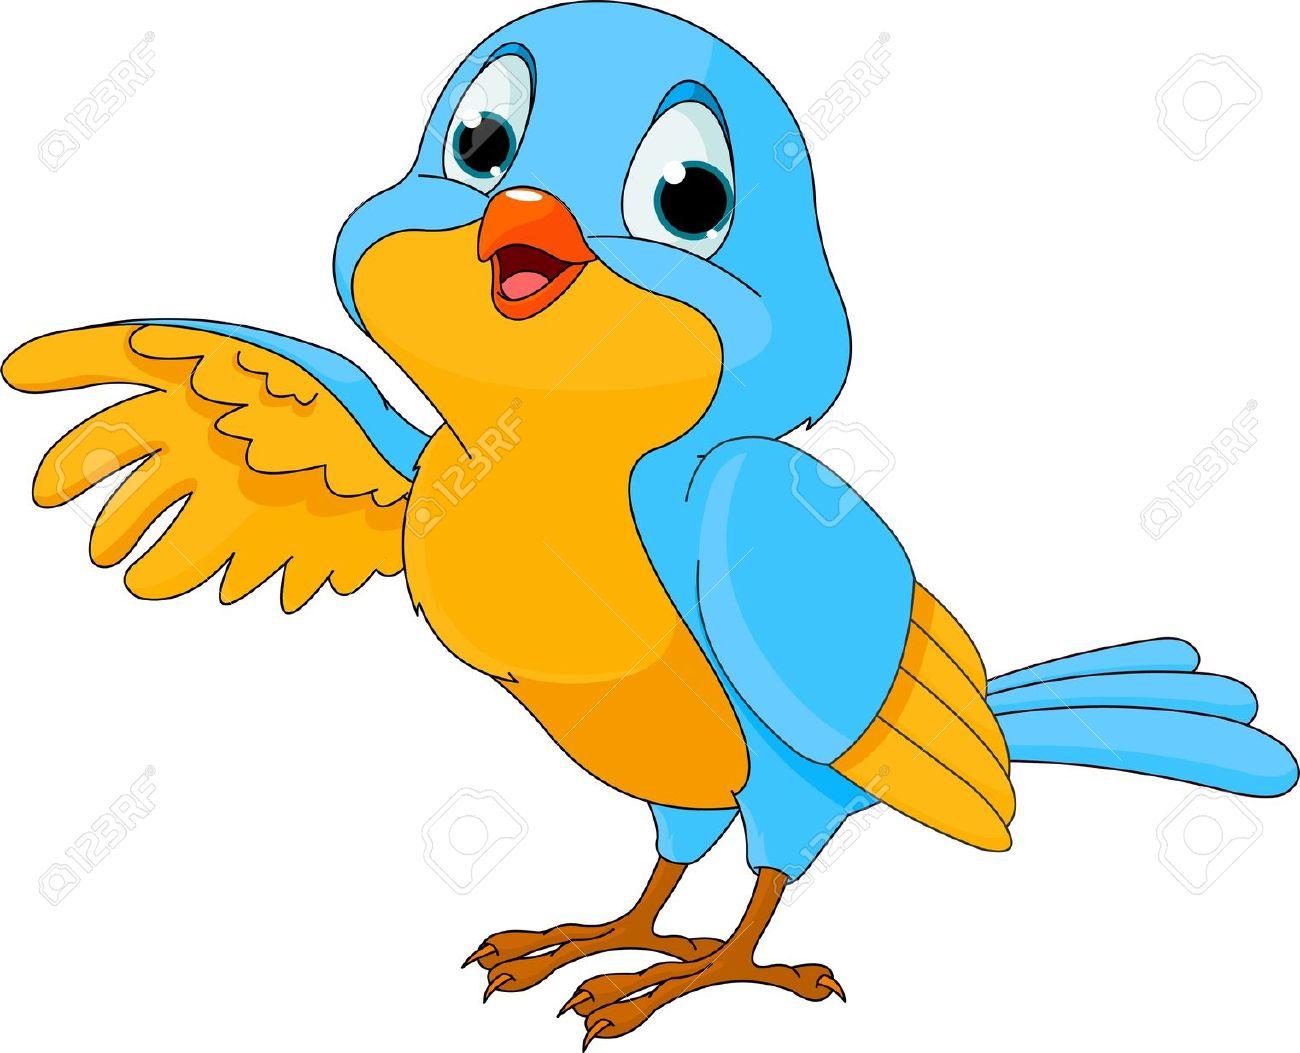 Clipart oiseau.